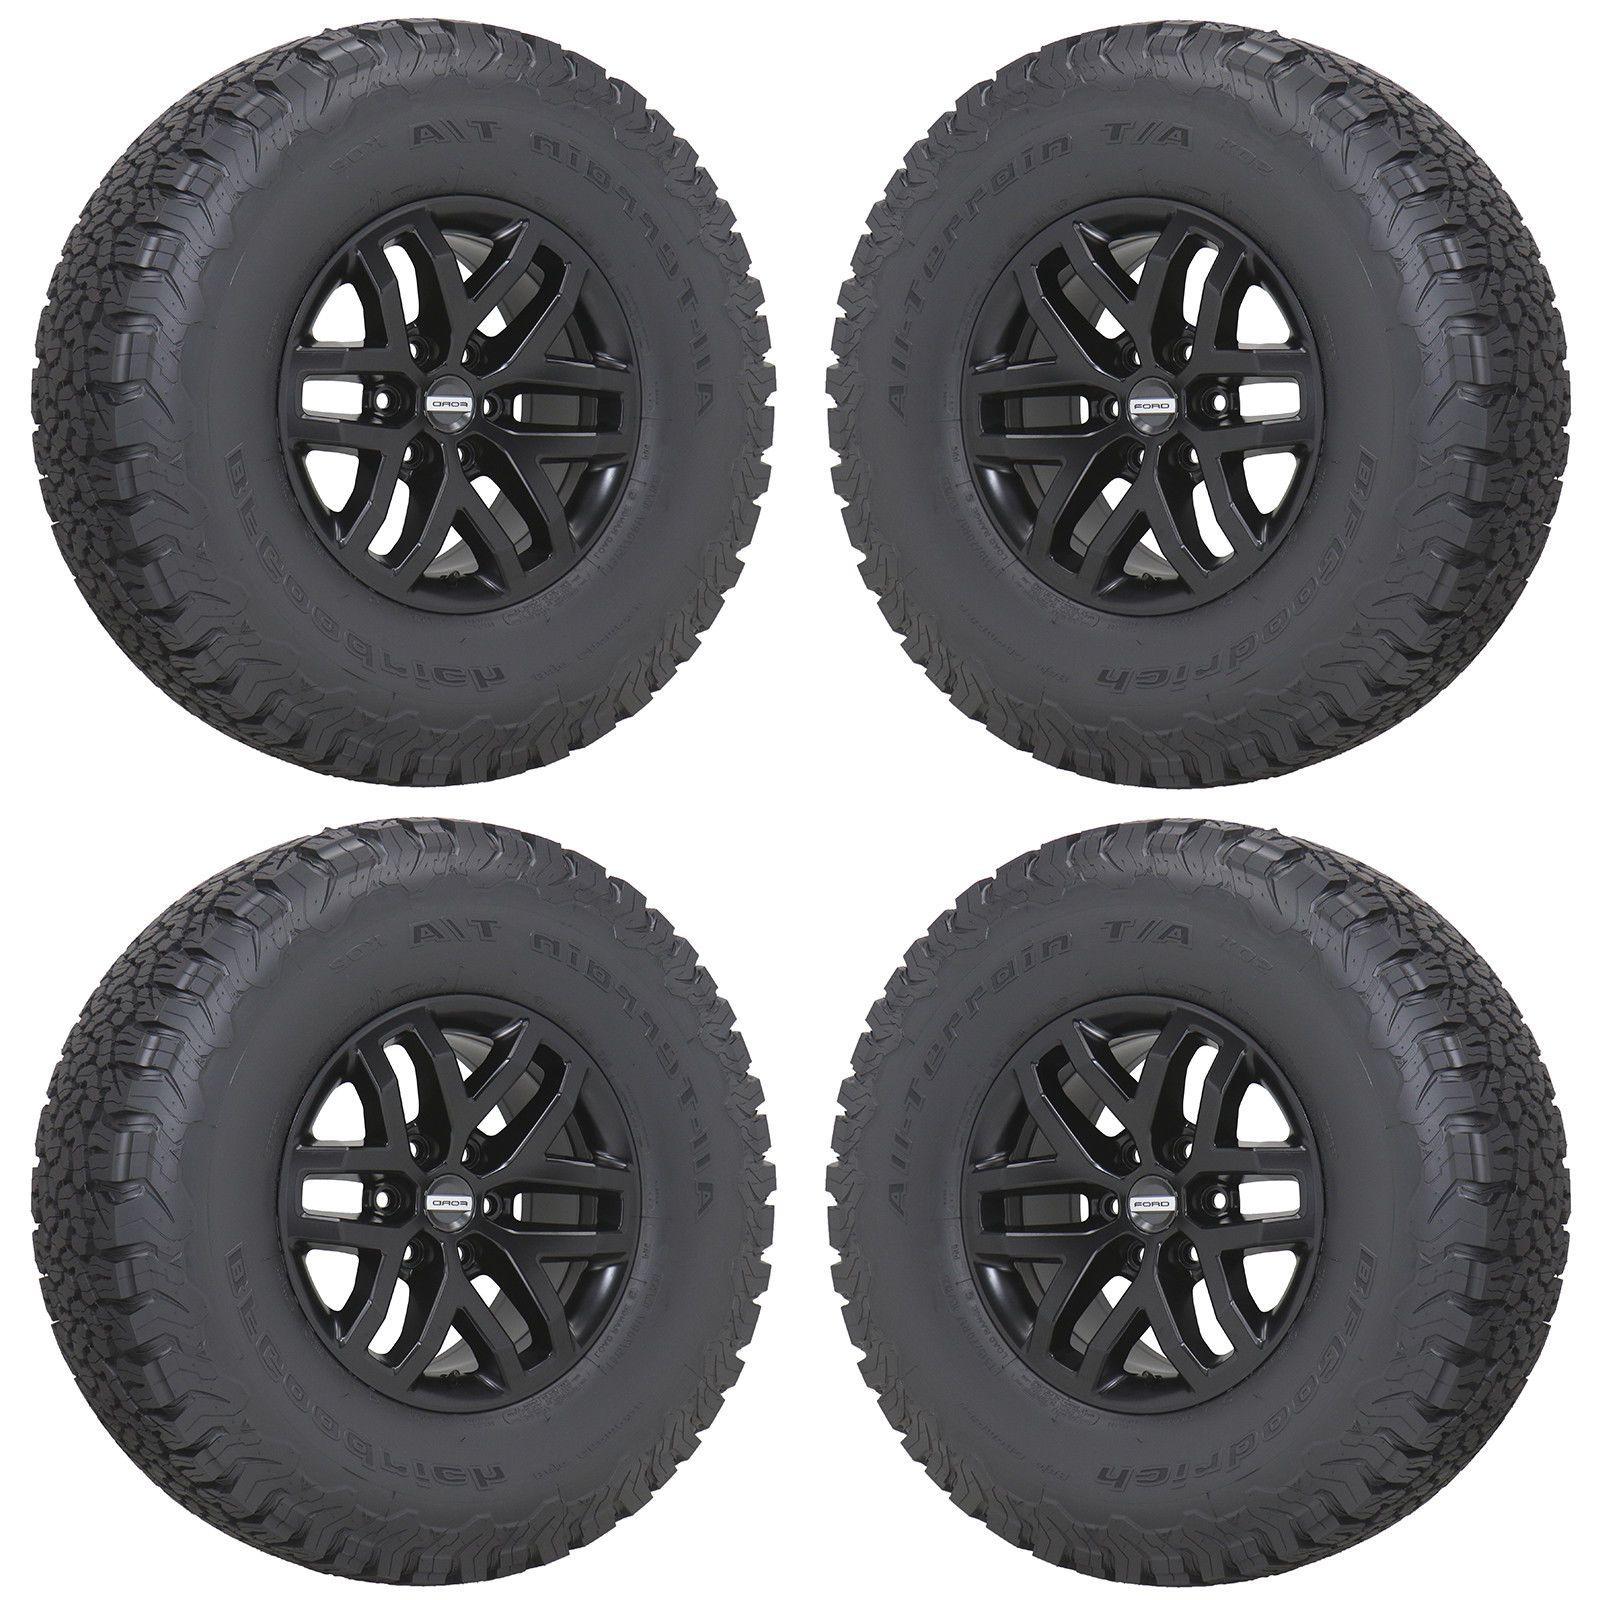 17 Ford F150 Raptor Truck Black Wheels Rims Tires 2017 2018 Set 4 10115 Ebay Ford F150 Raptor Raptor Truck Wheel Rims